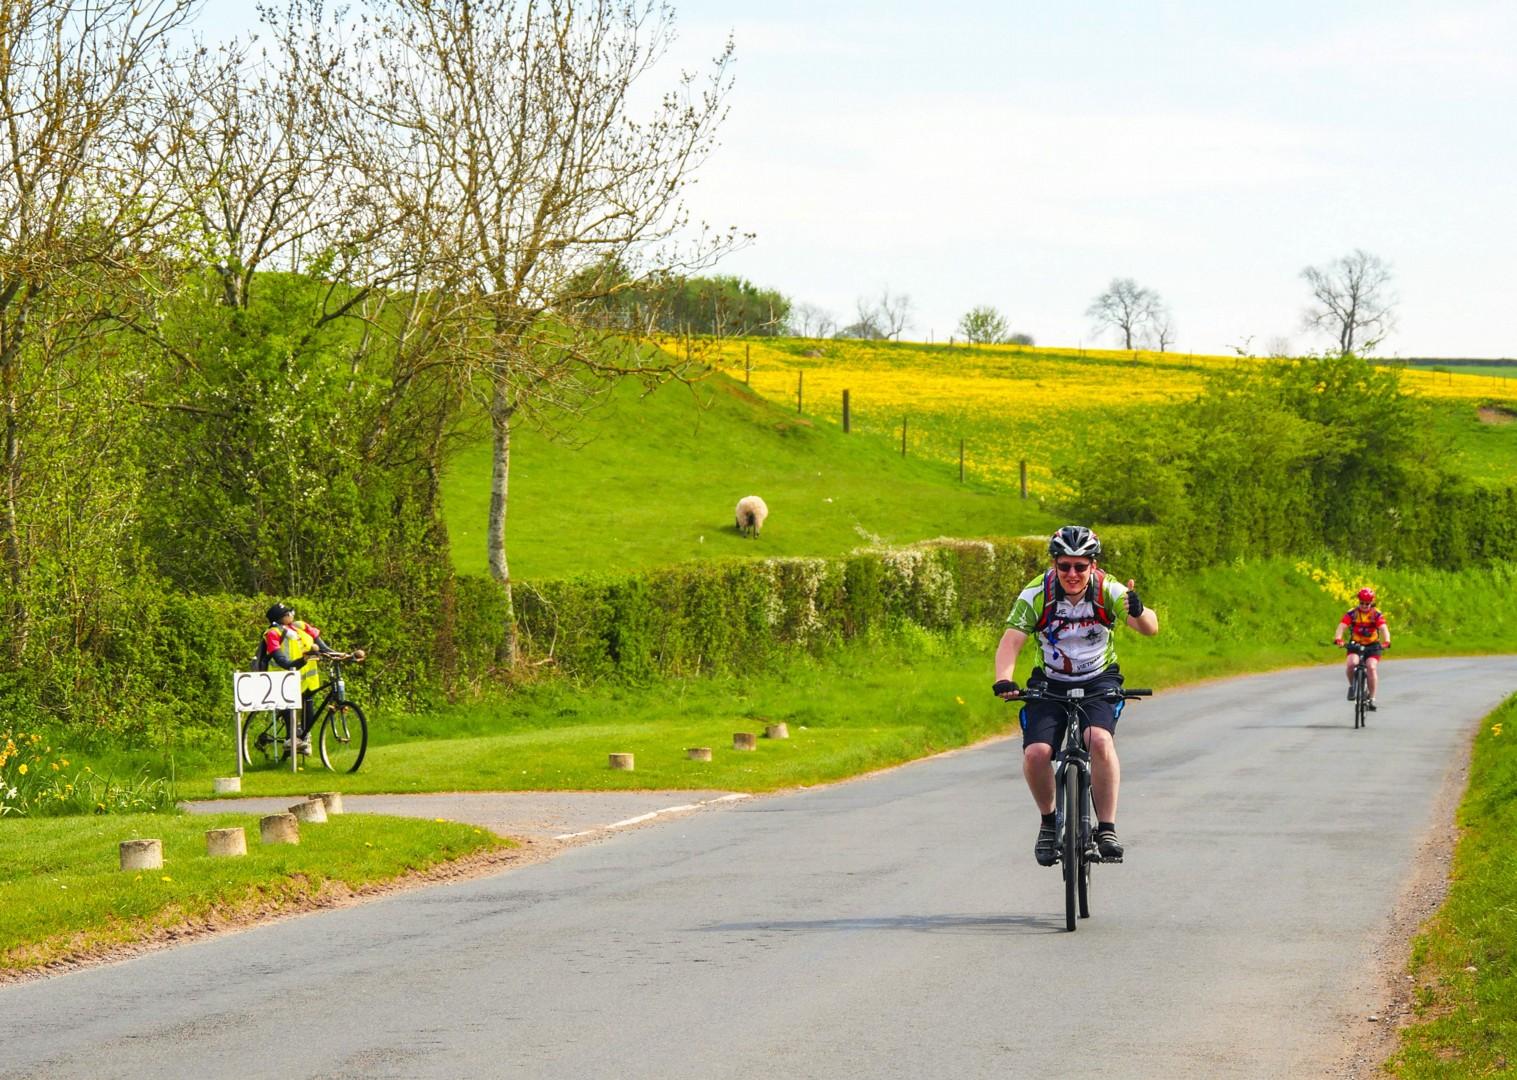 british-fields-rural-cyclepaths-bike-leisure-self-guided-green.jpg - UK - C2C - Coast to Coast 4 Days Cycling - Self-Guided Leisure Cycling Holiday - Leisure Cycling